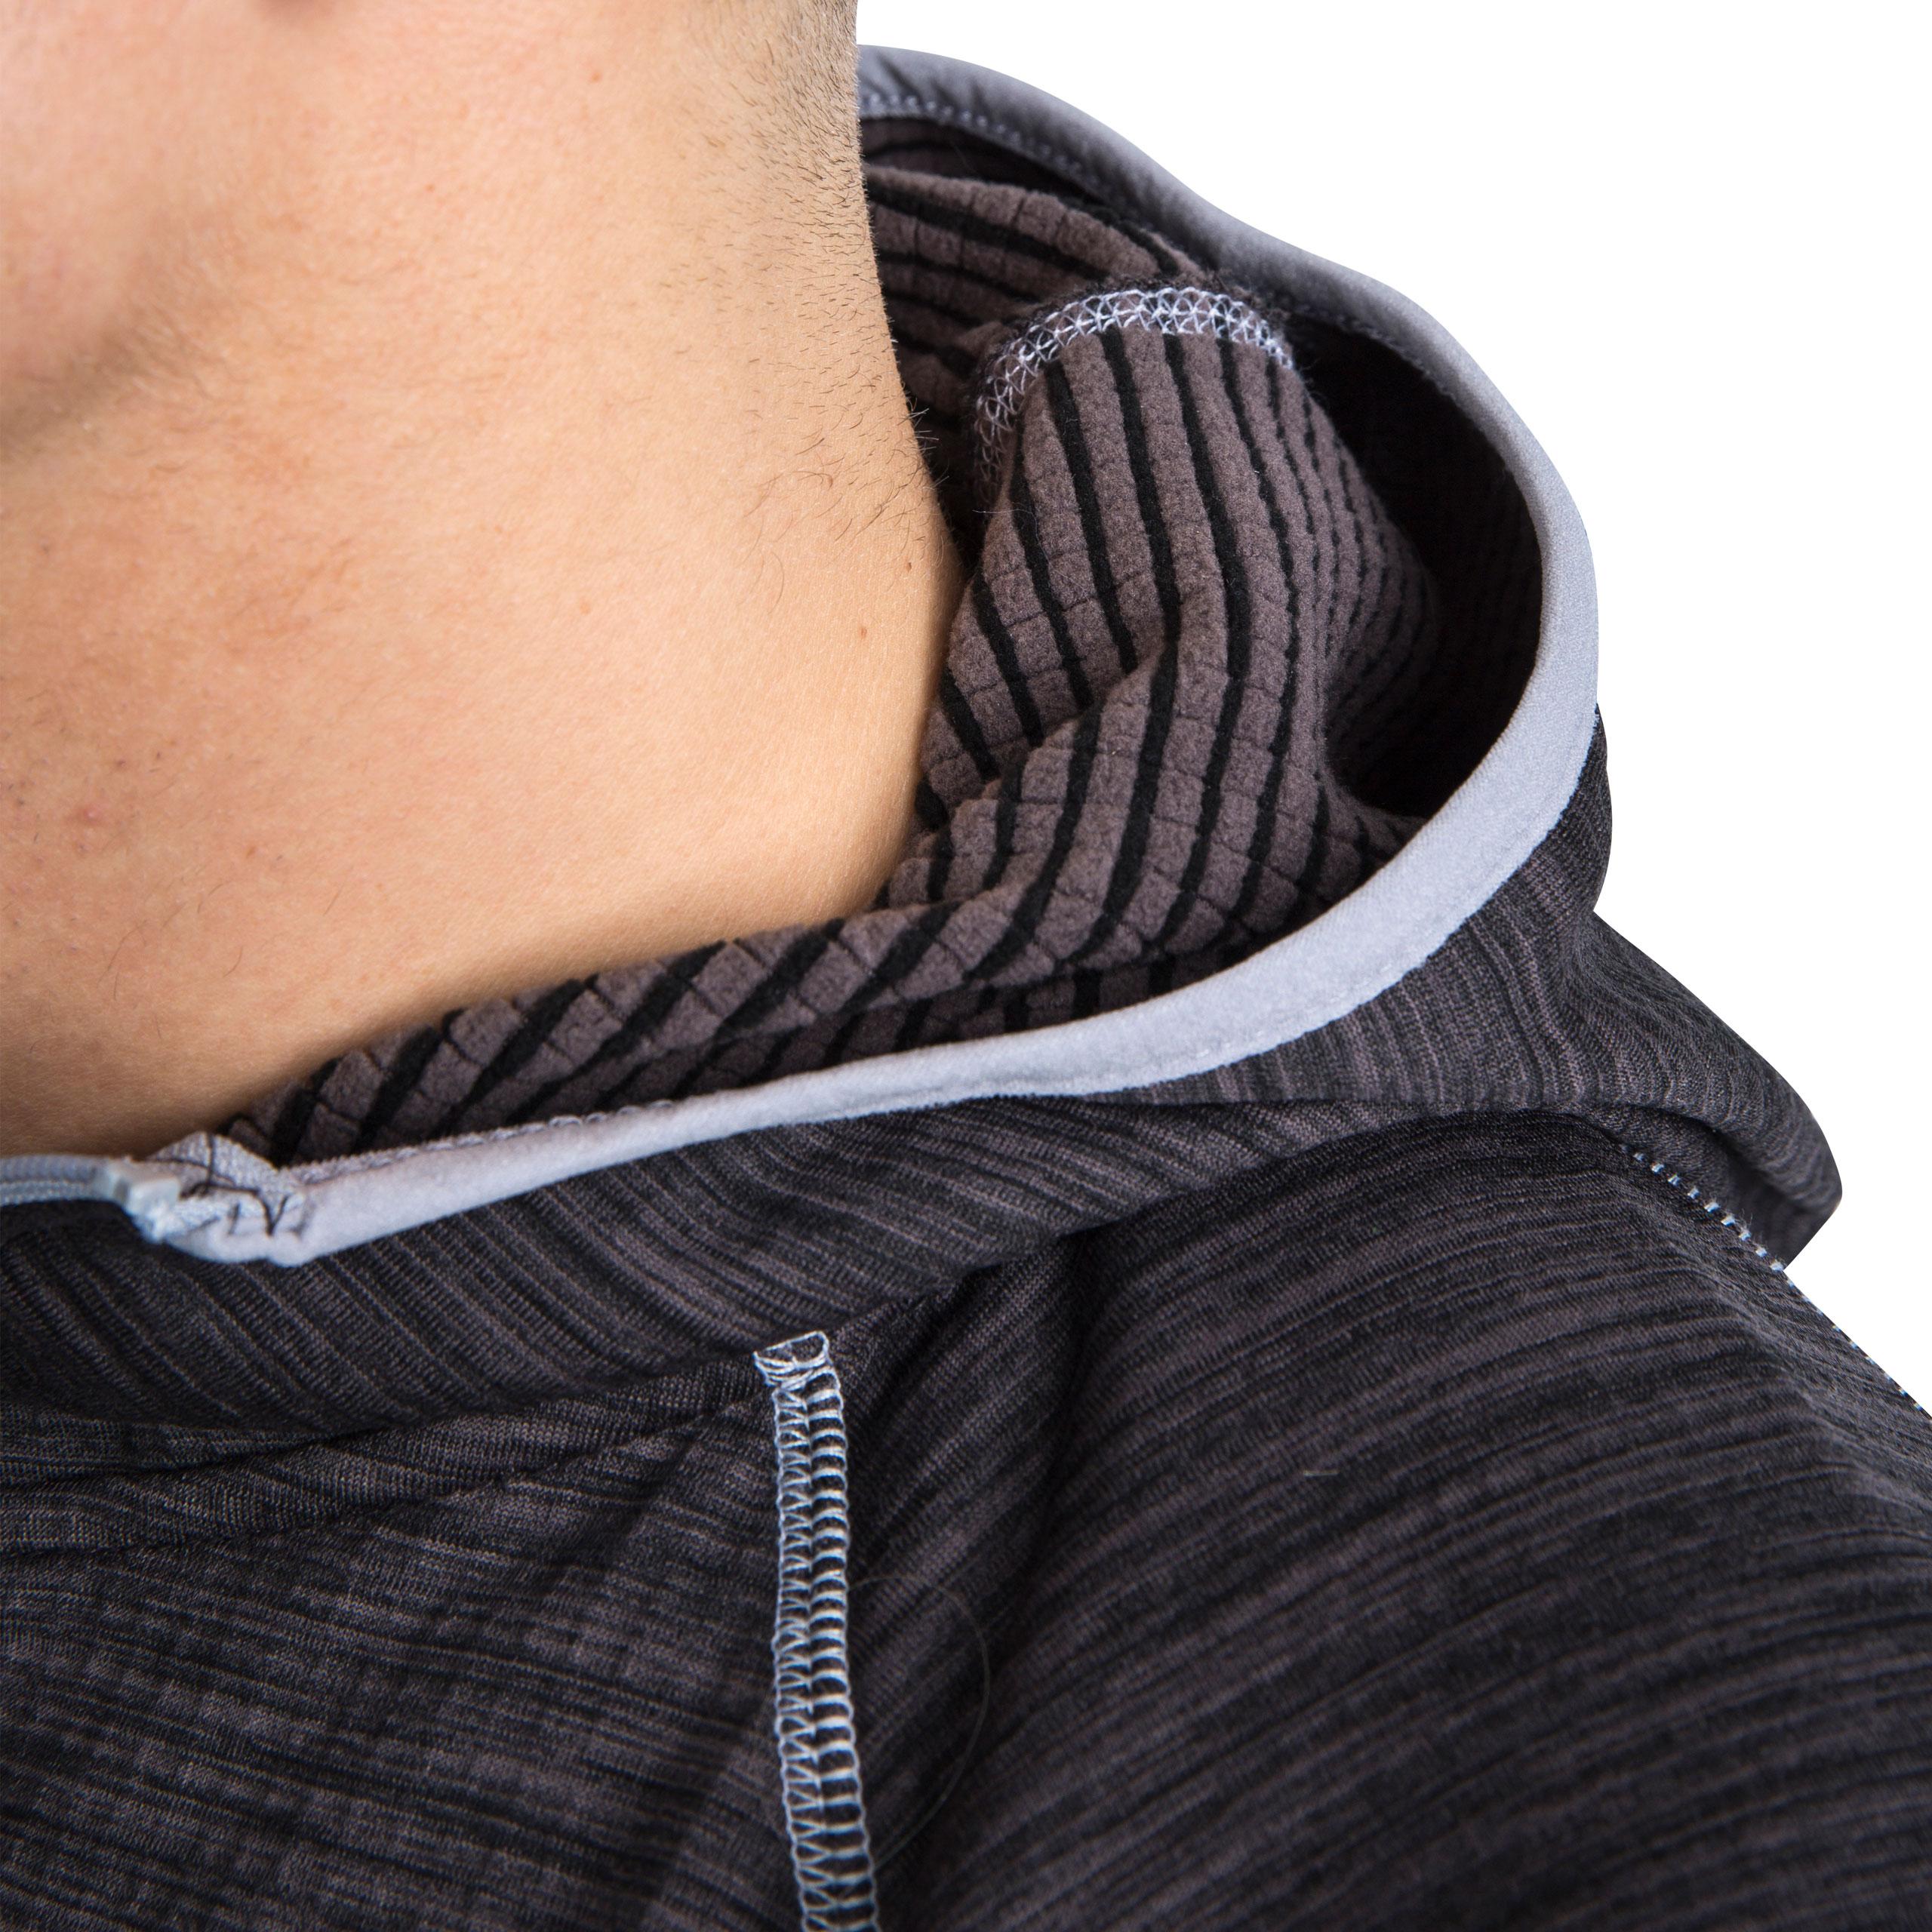 Trespass-Shale-Mens-Pull-Over-Hooded-Fleece-Warm-Hiking-Jumper thumbnail 14